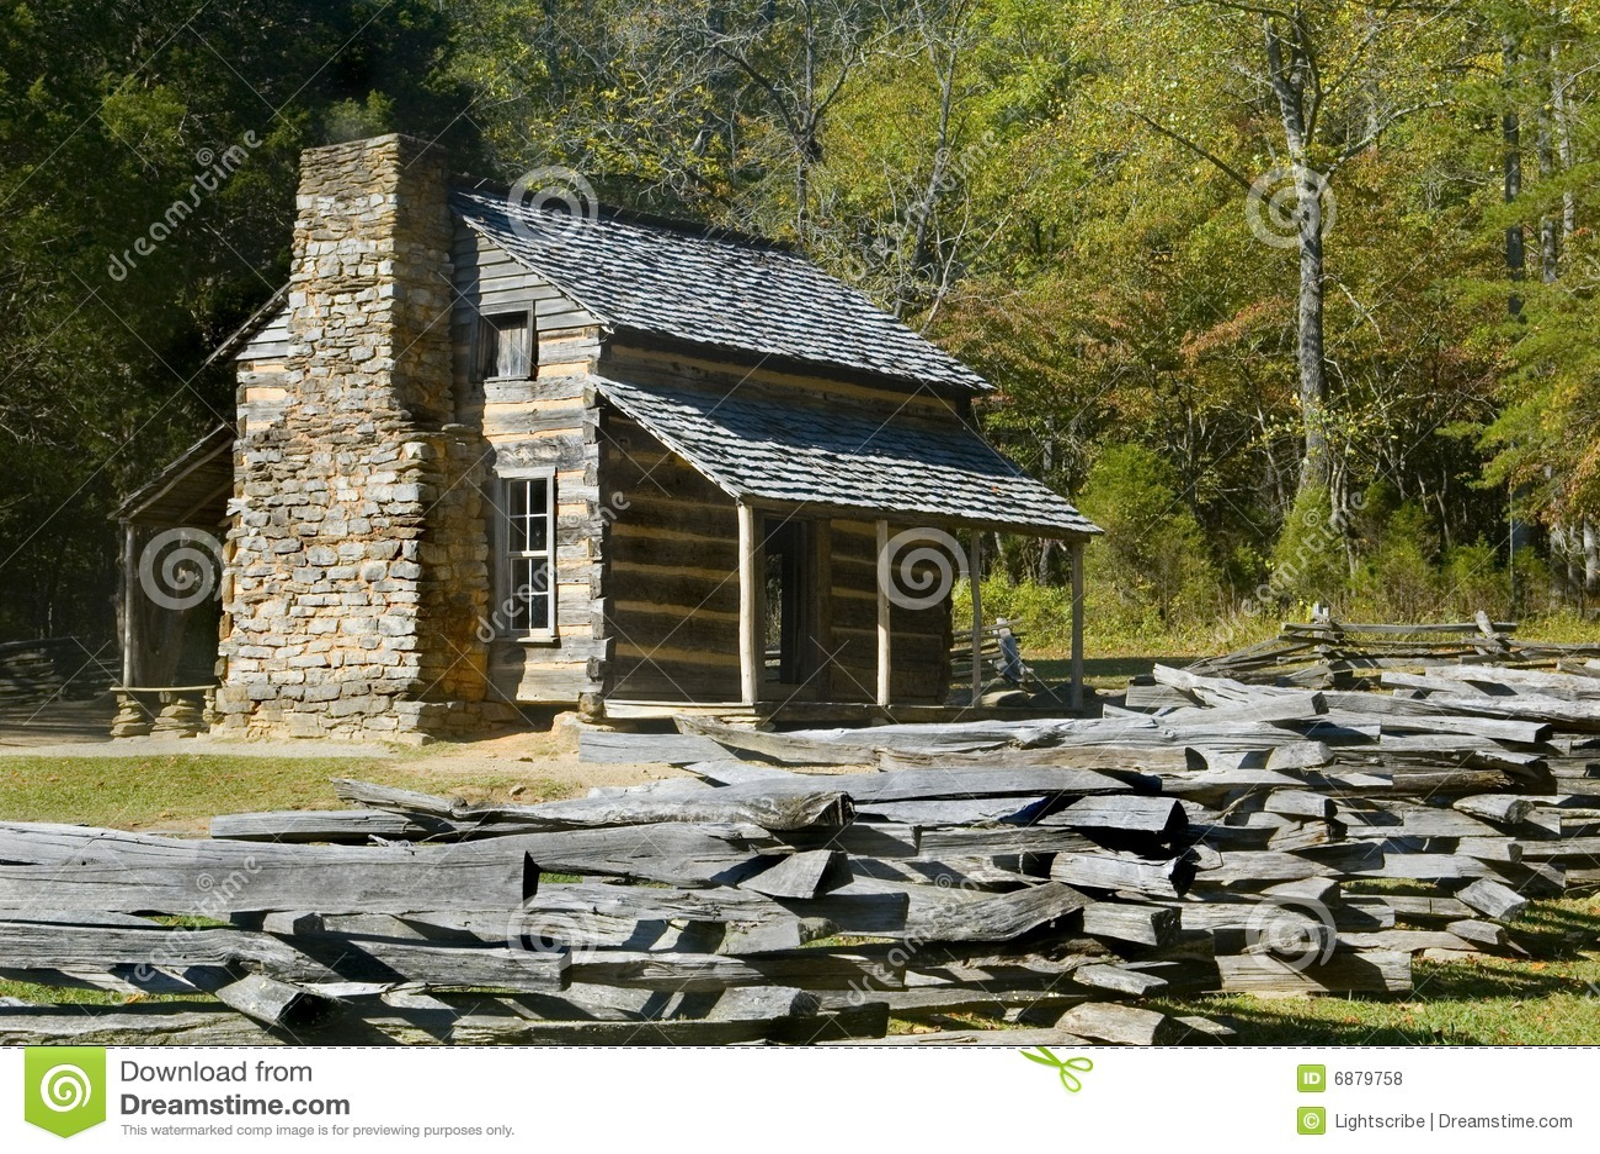 log-cabin-cades-cove-great-smoky-mountai